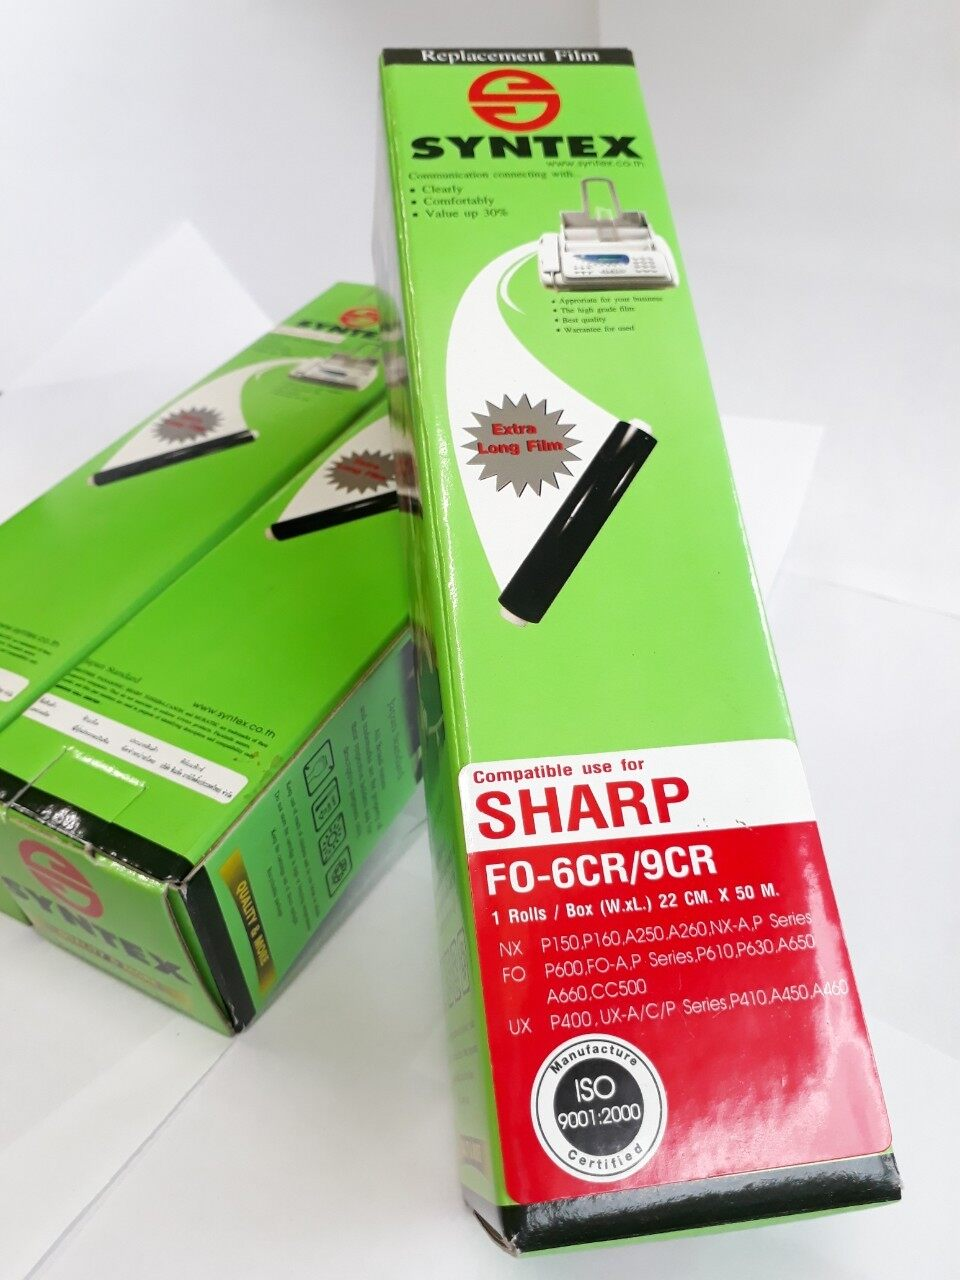 Film Fax Sharp Fo-6-Cr/9cr 1ม้วน/กล่อง.